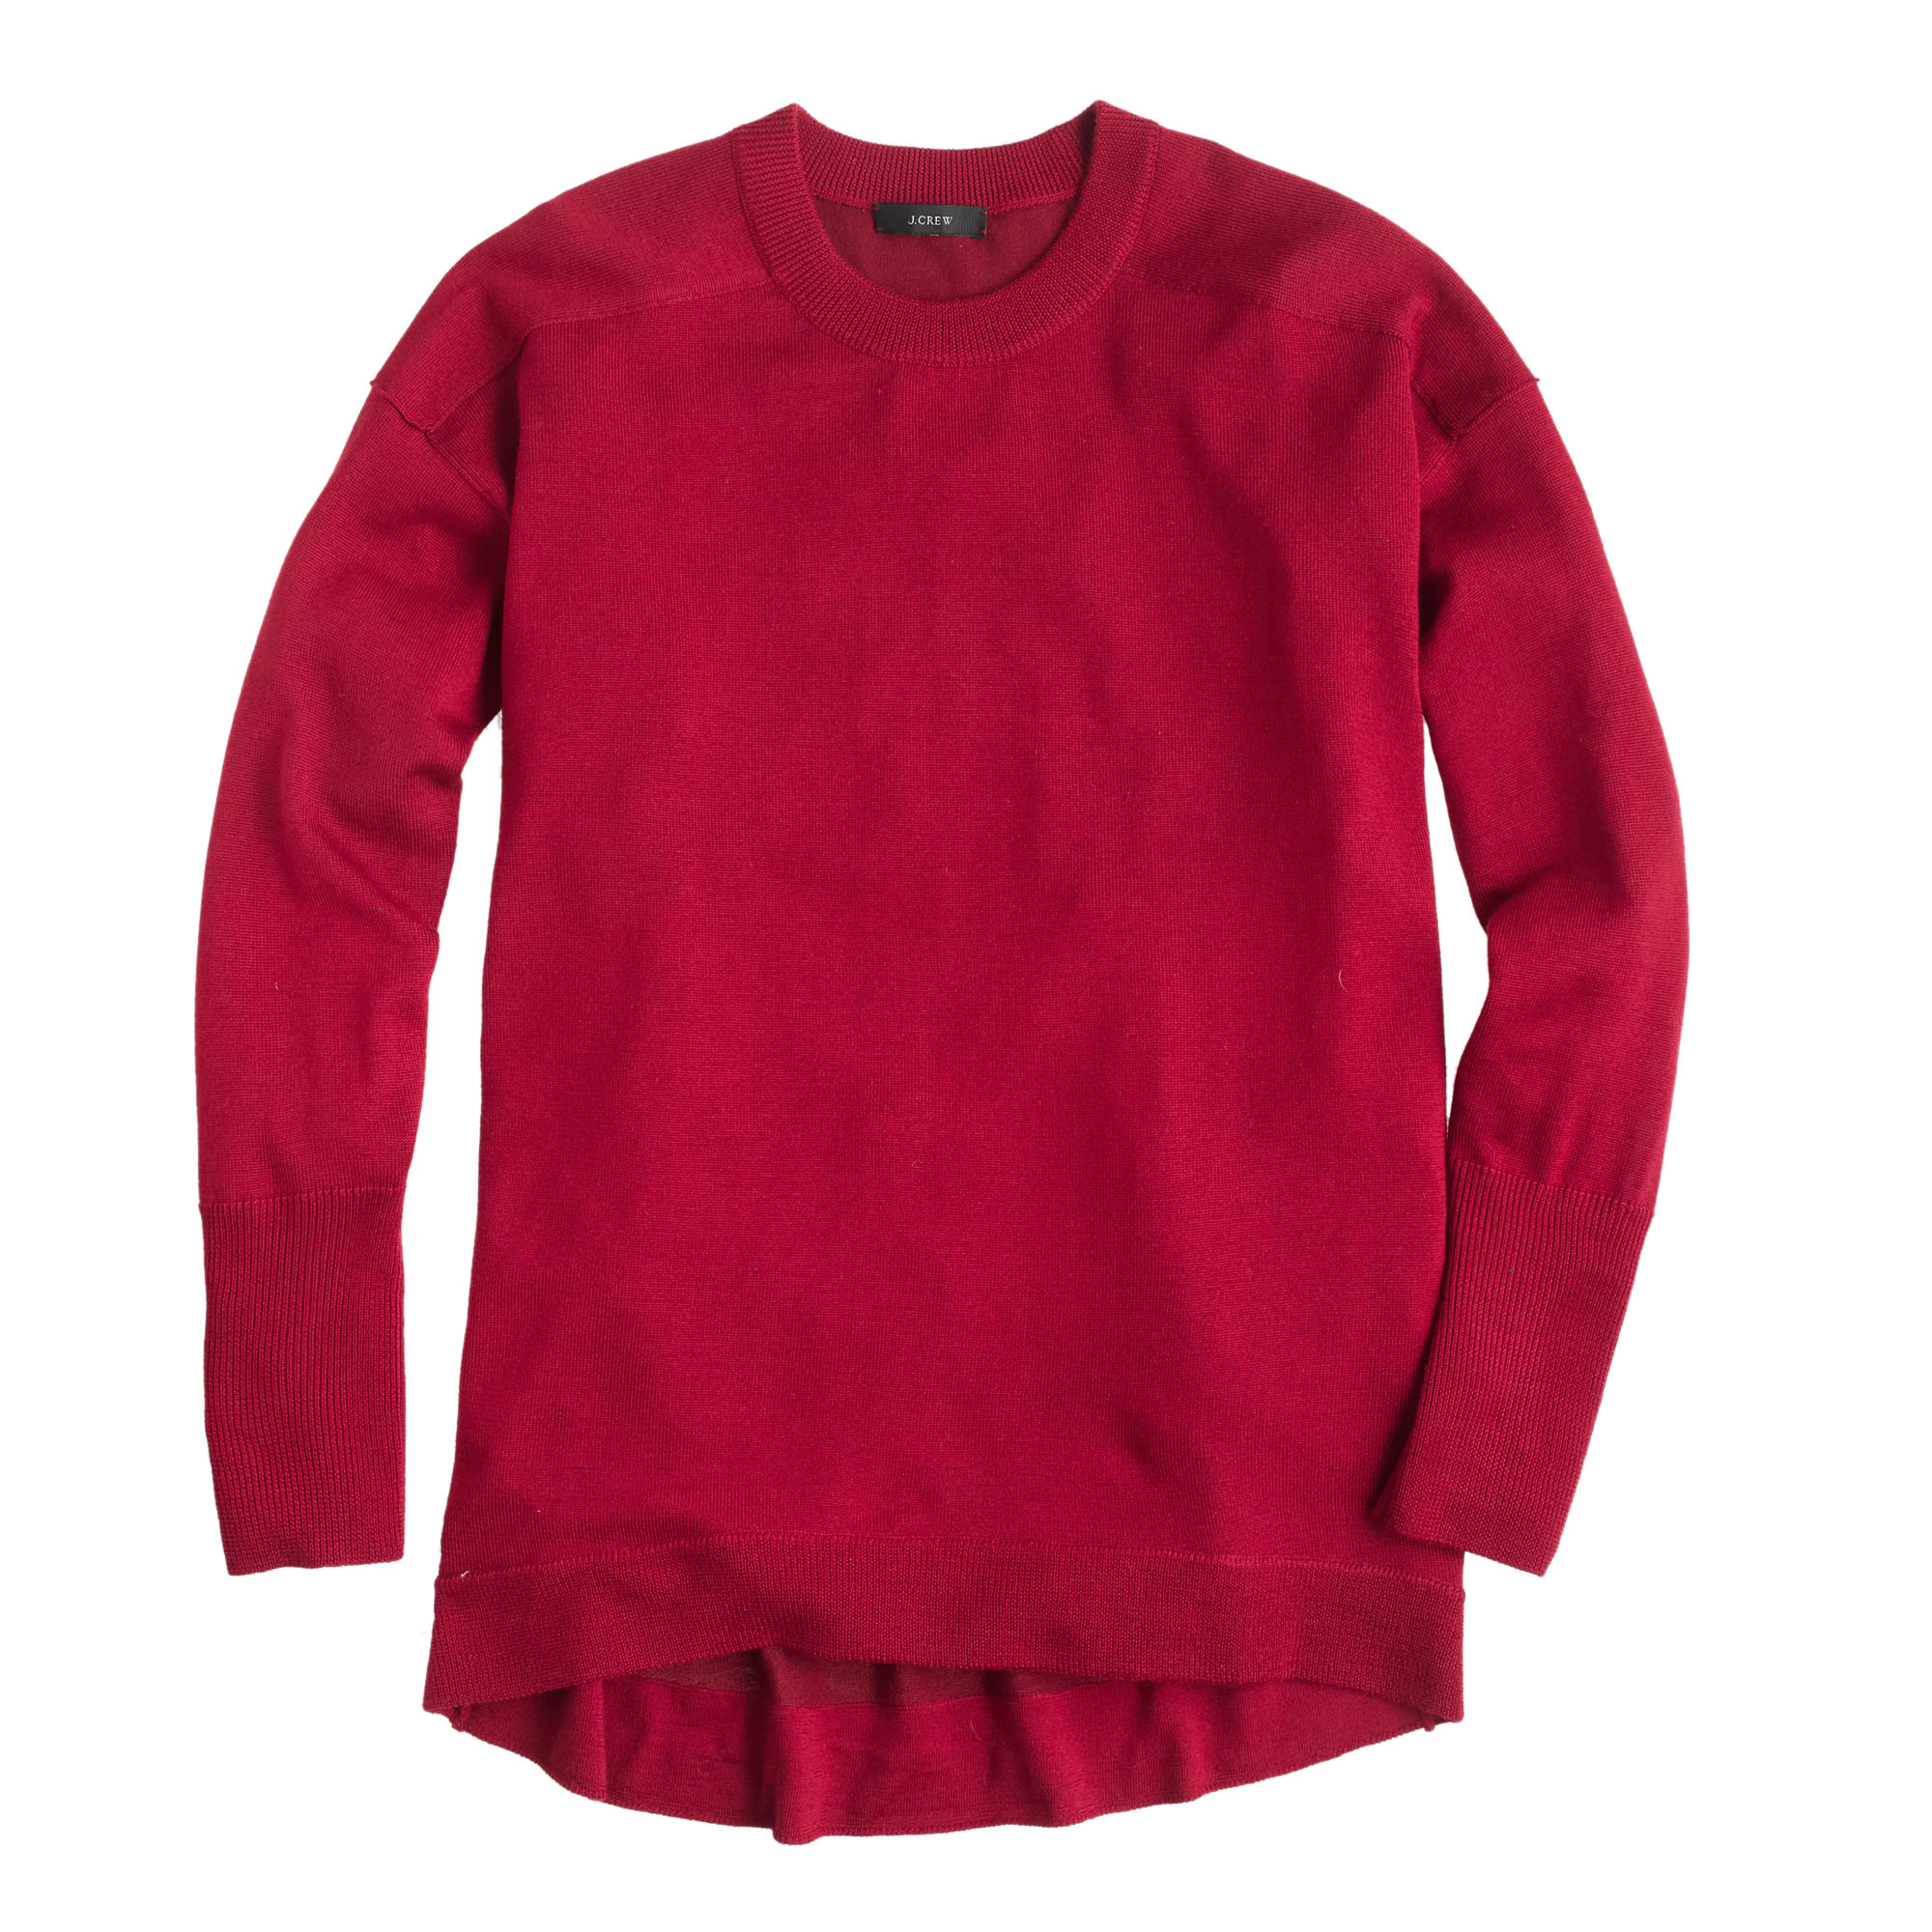 J.crew Merino-cotton Tunic Sweater in Red | Lyst